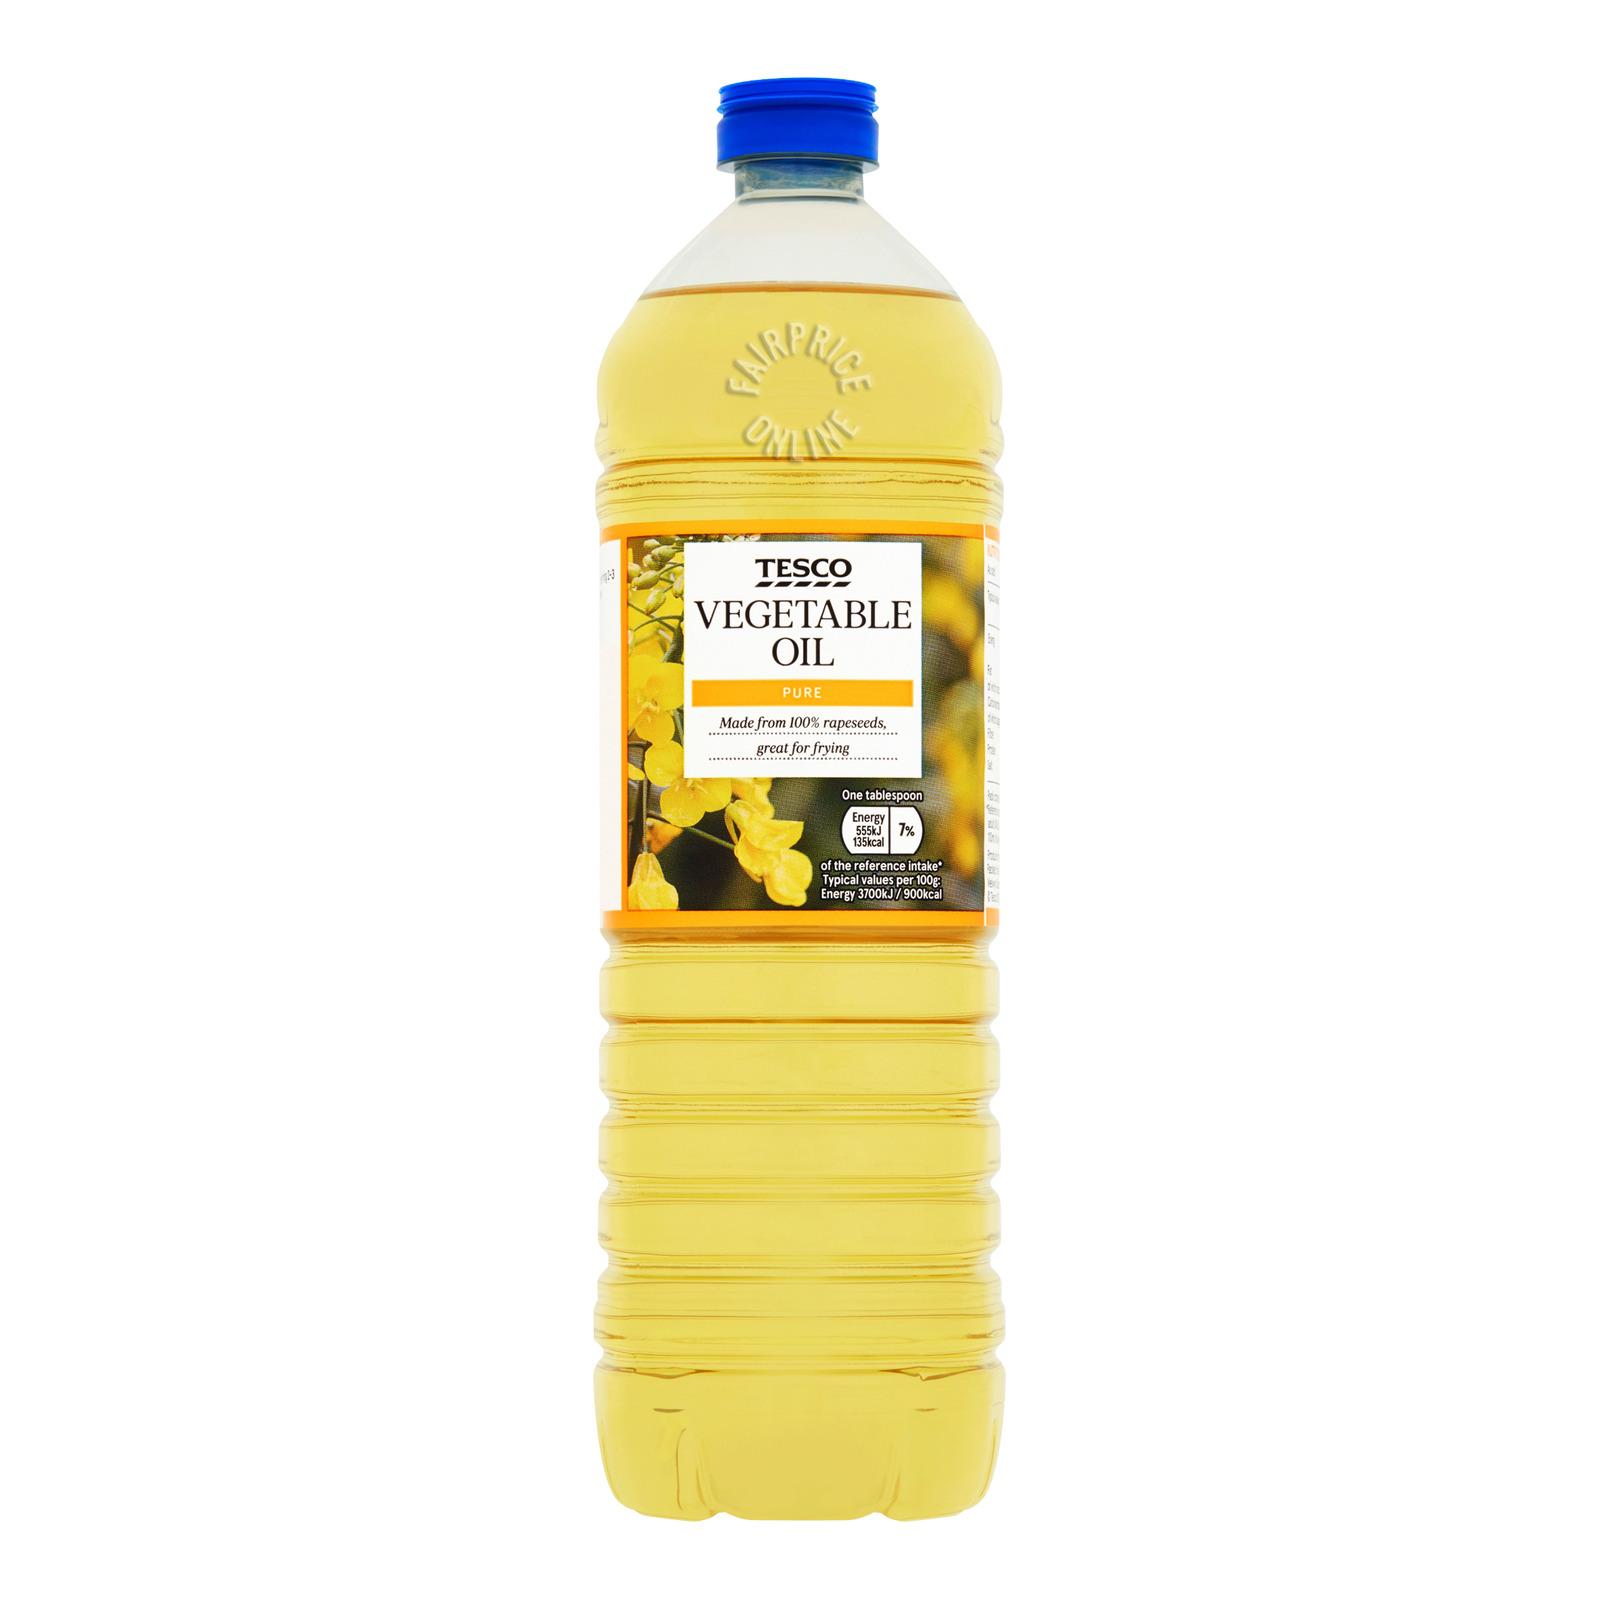 Tesco Pure Vegetable Oil